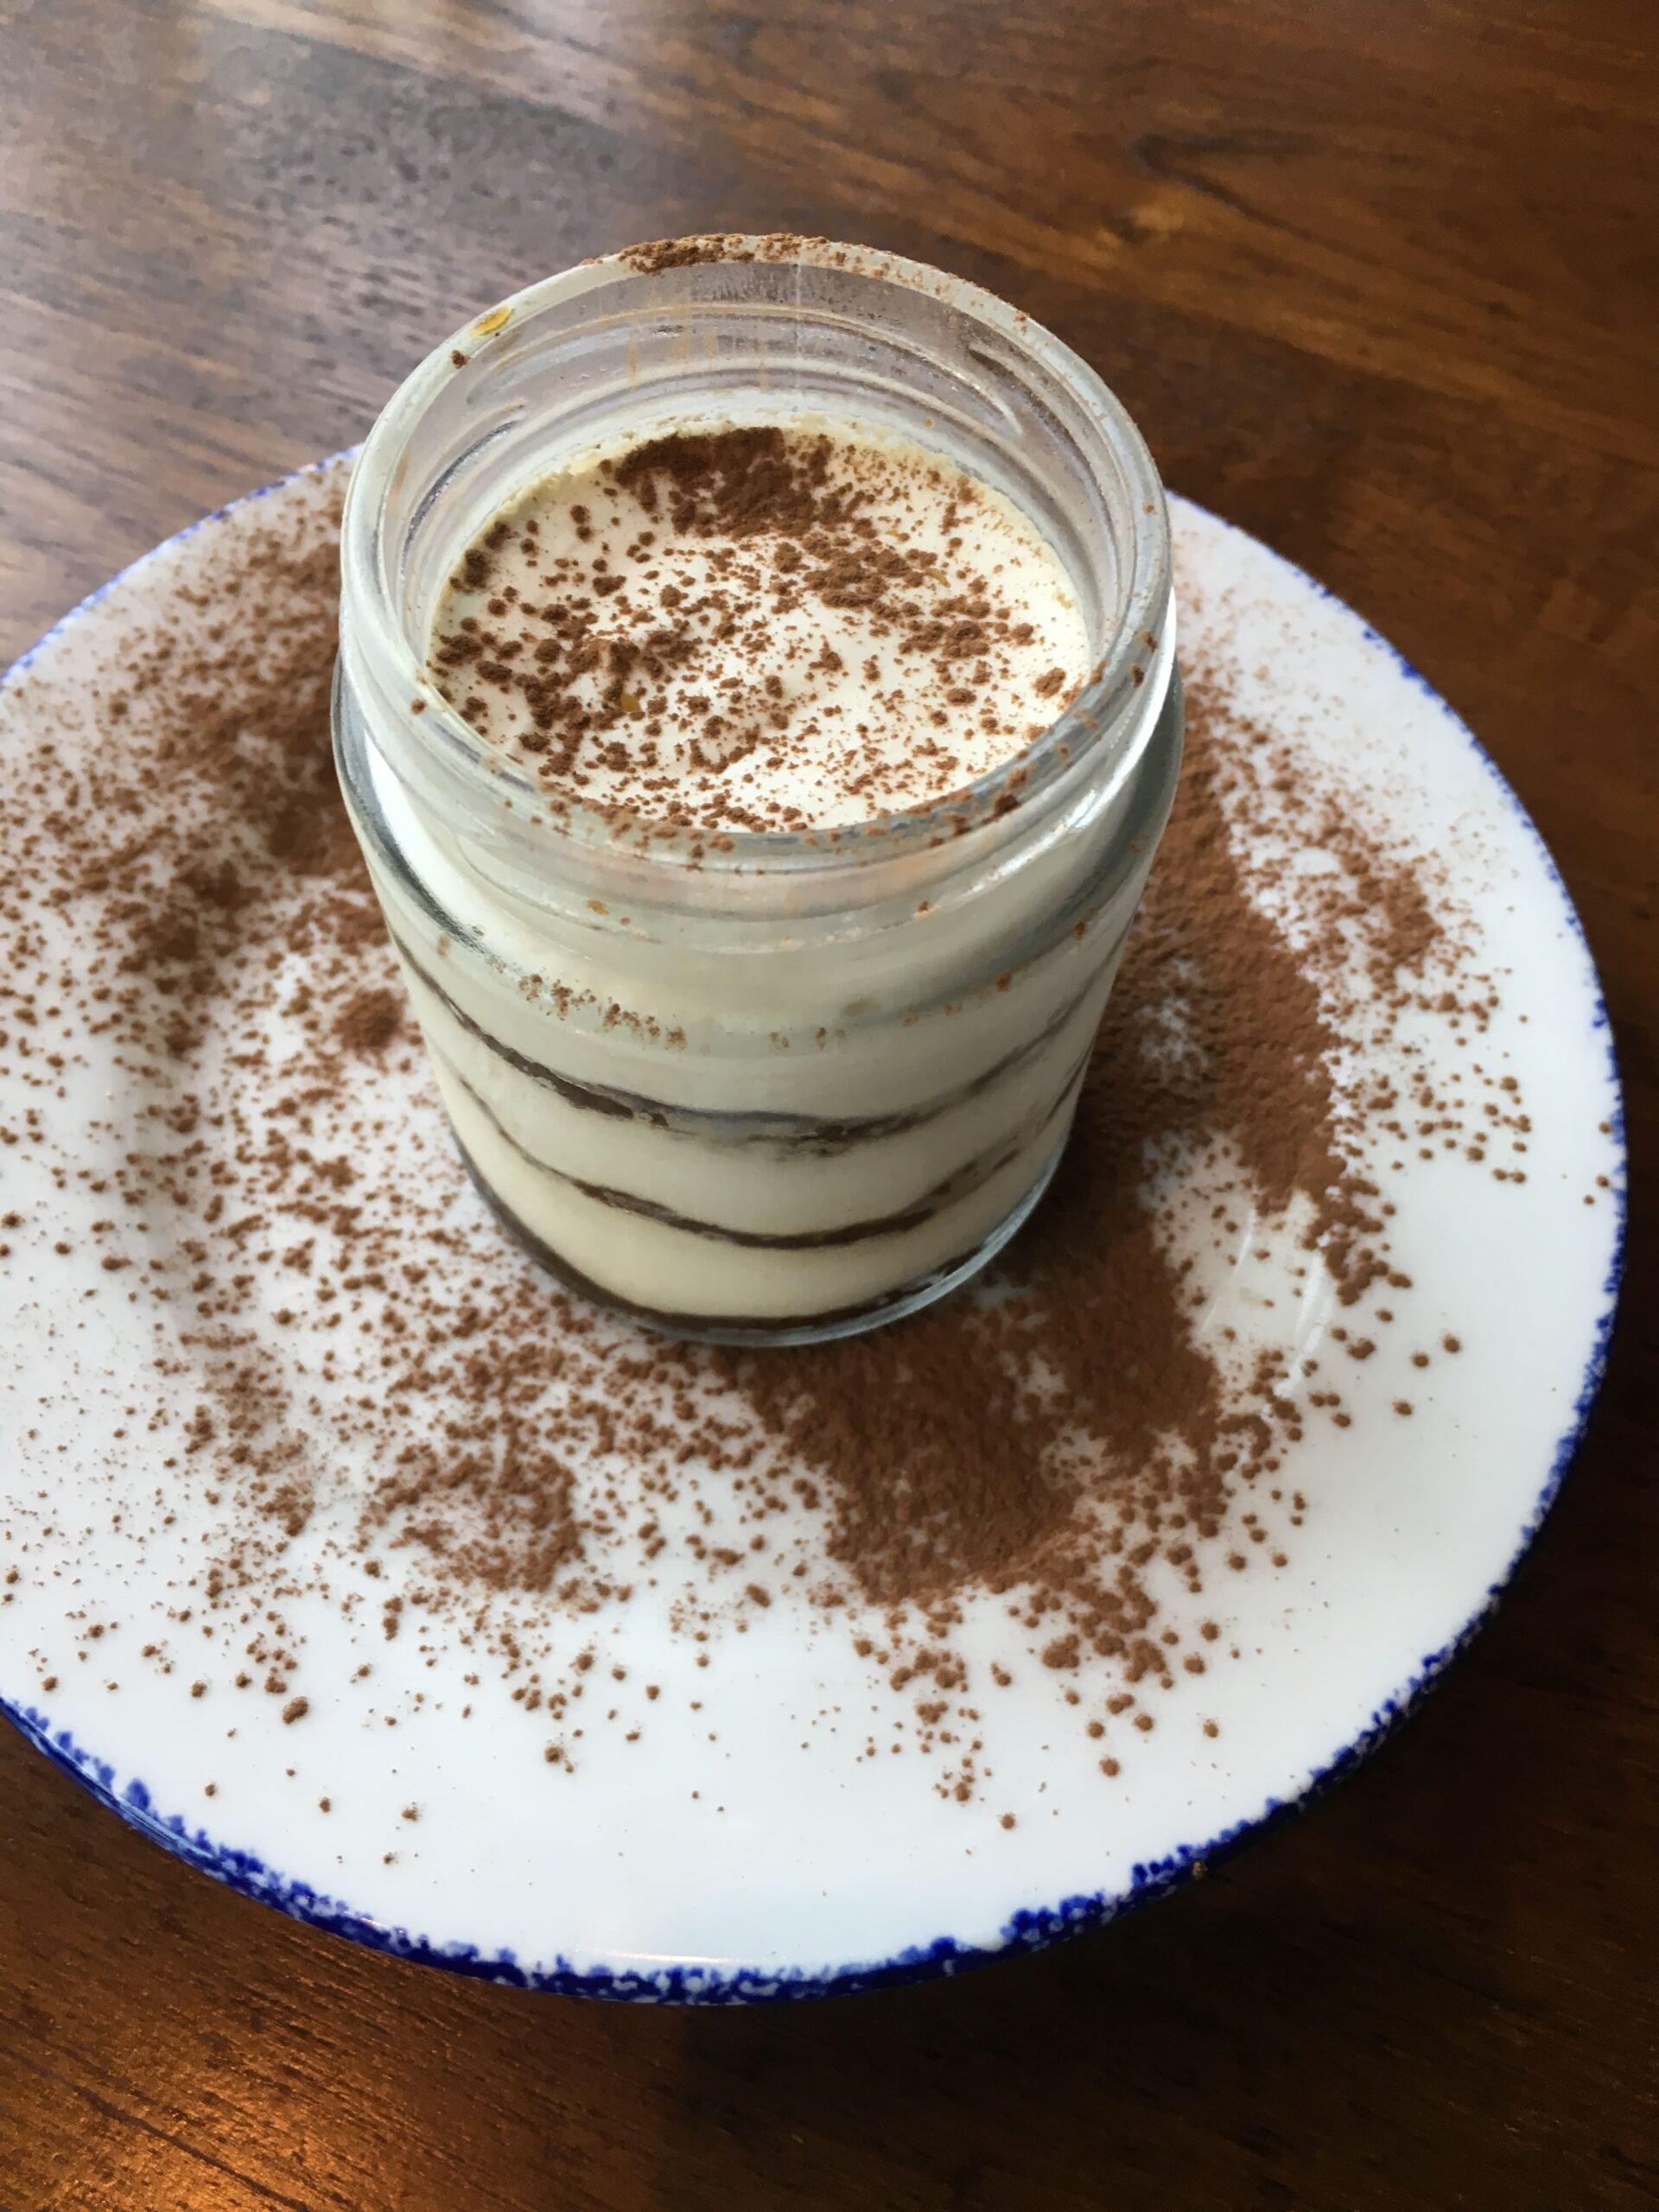 tiramisu in italy food bucket list in mason jar